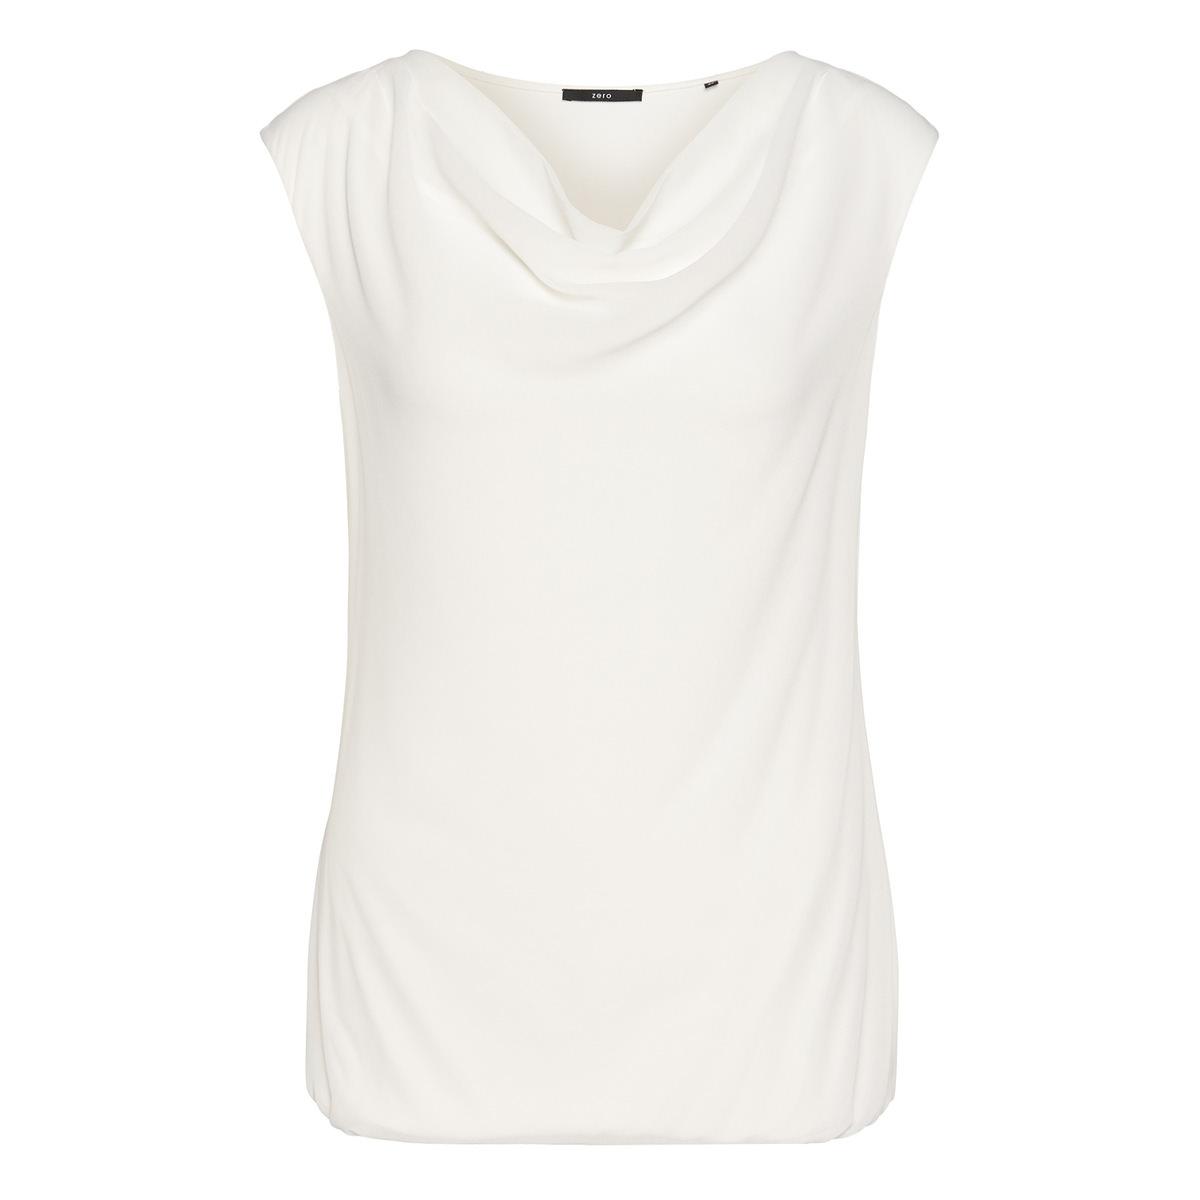 Blusenshirt mit Chiffon-Front in offwhite